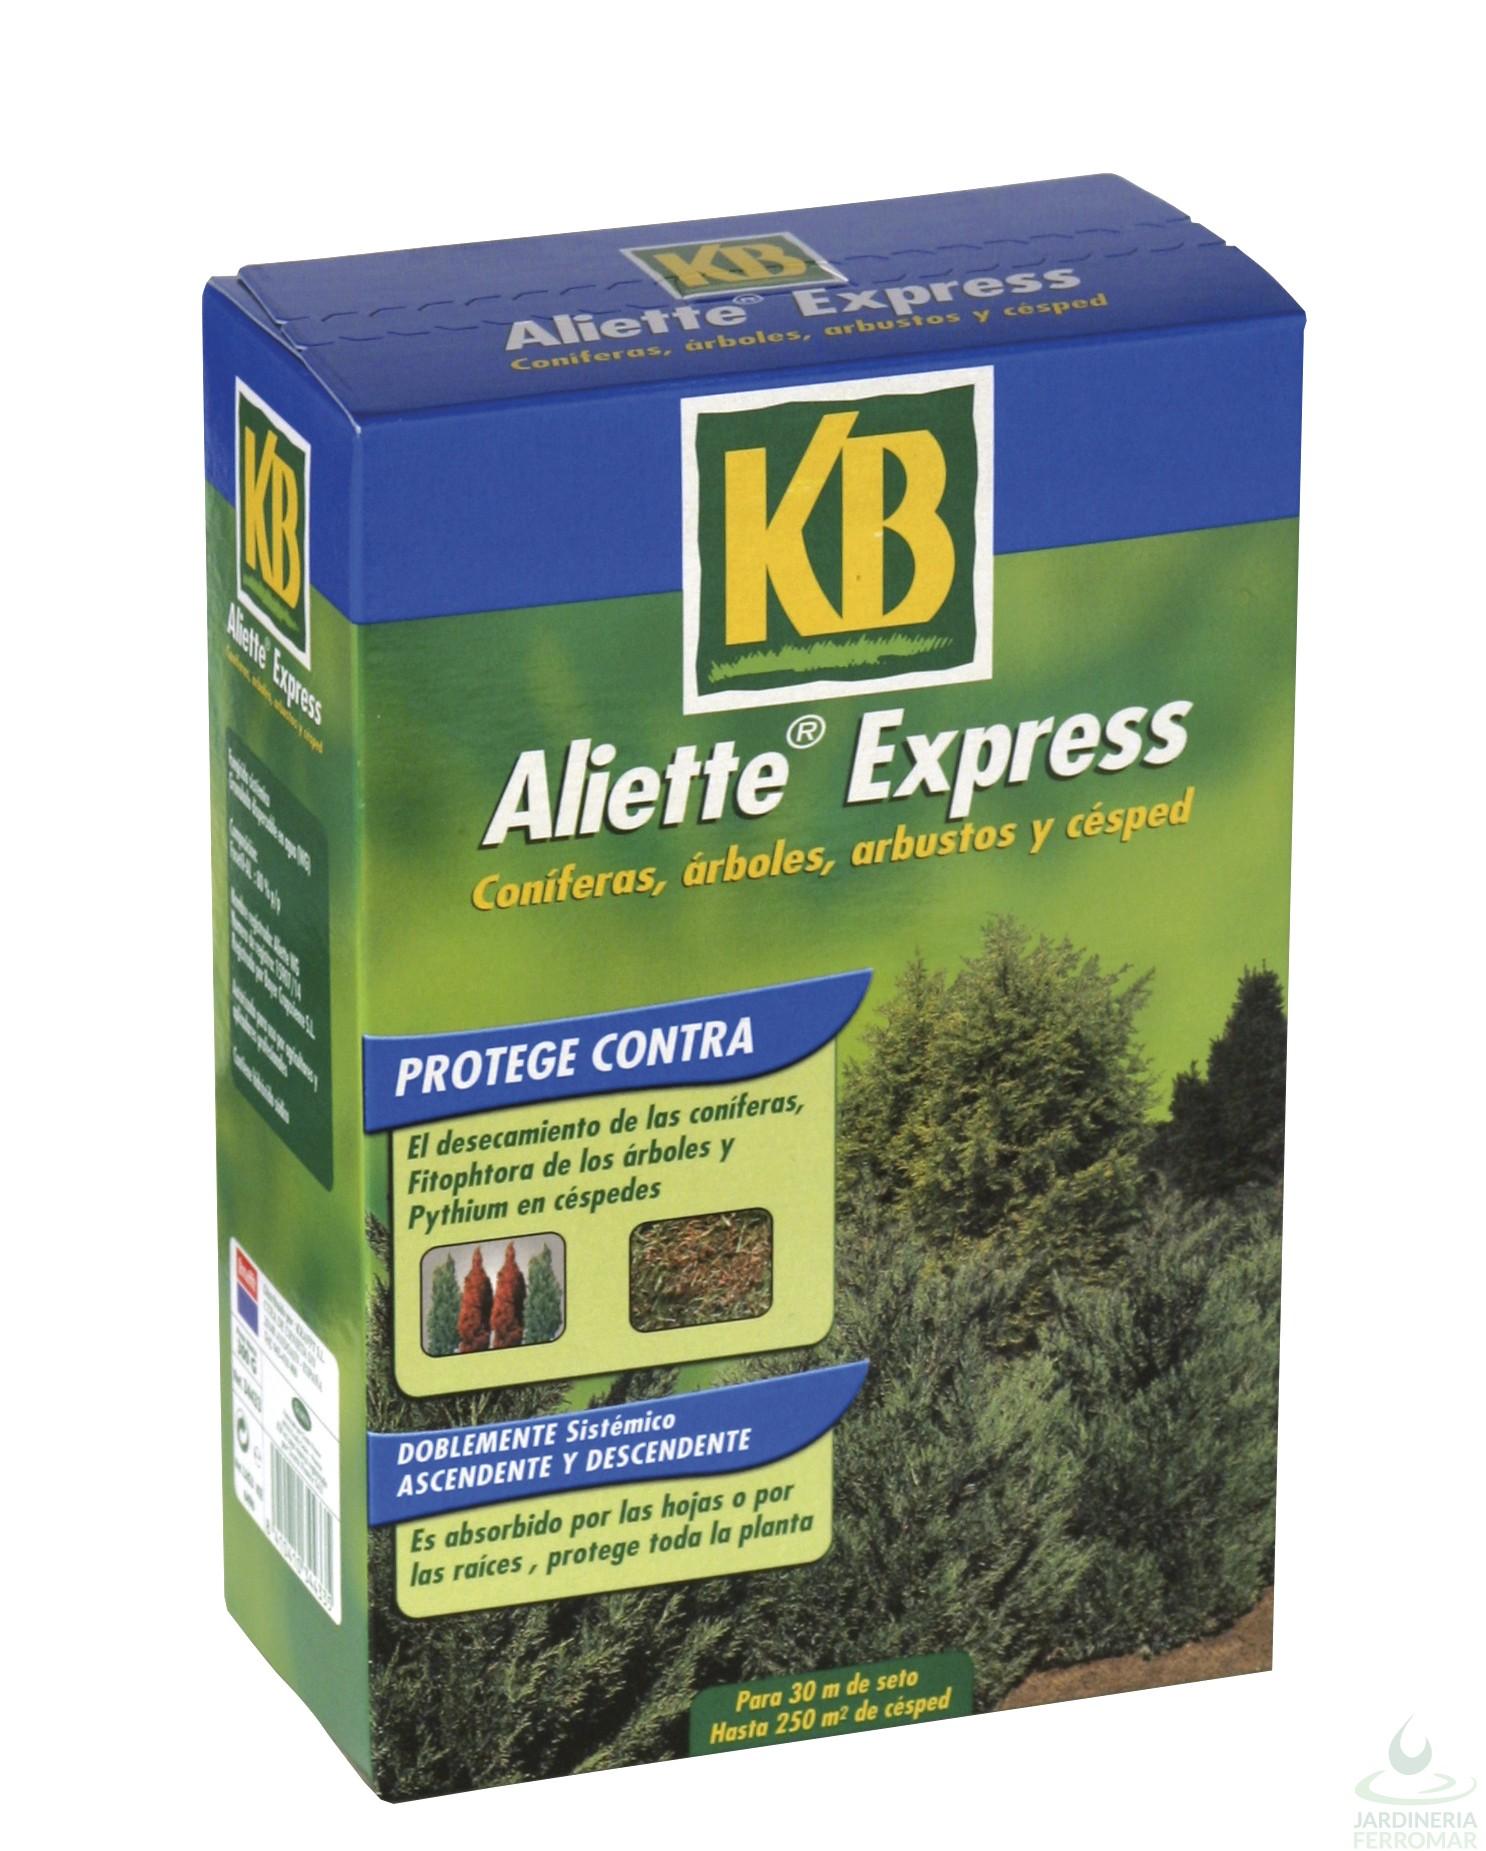 KB Aliete Express Funguicida 300 gramos